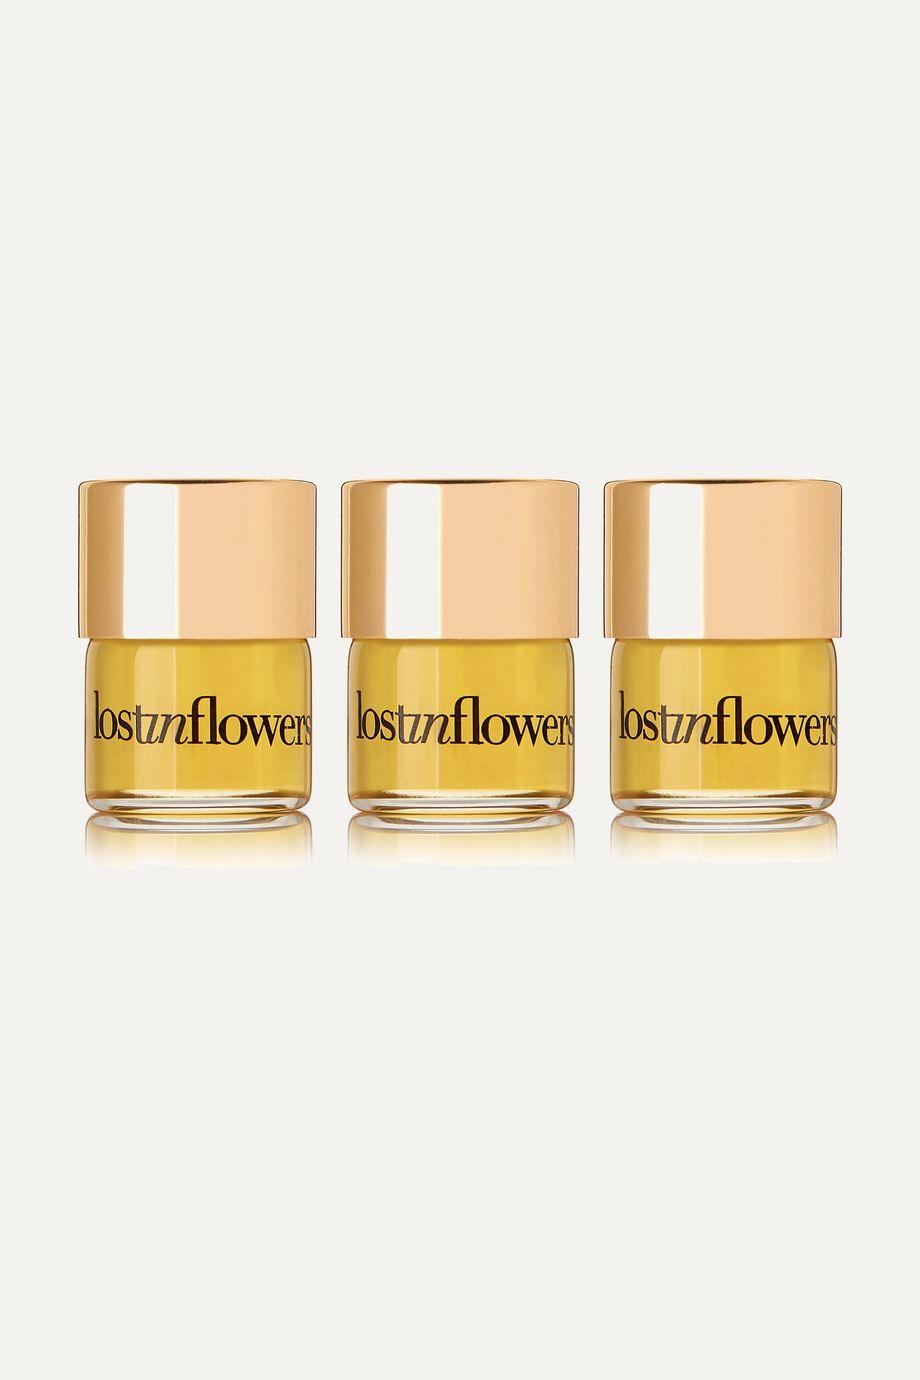 strangelove nyc Perfume Oil Travel Set - lostinflowers, 3 x 1.25ml